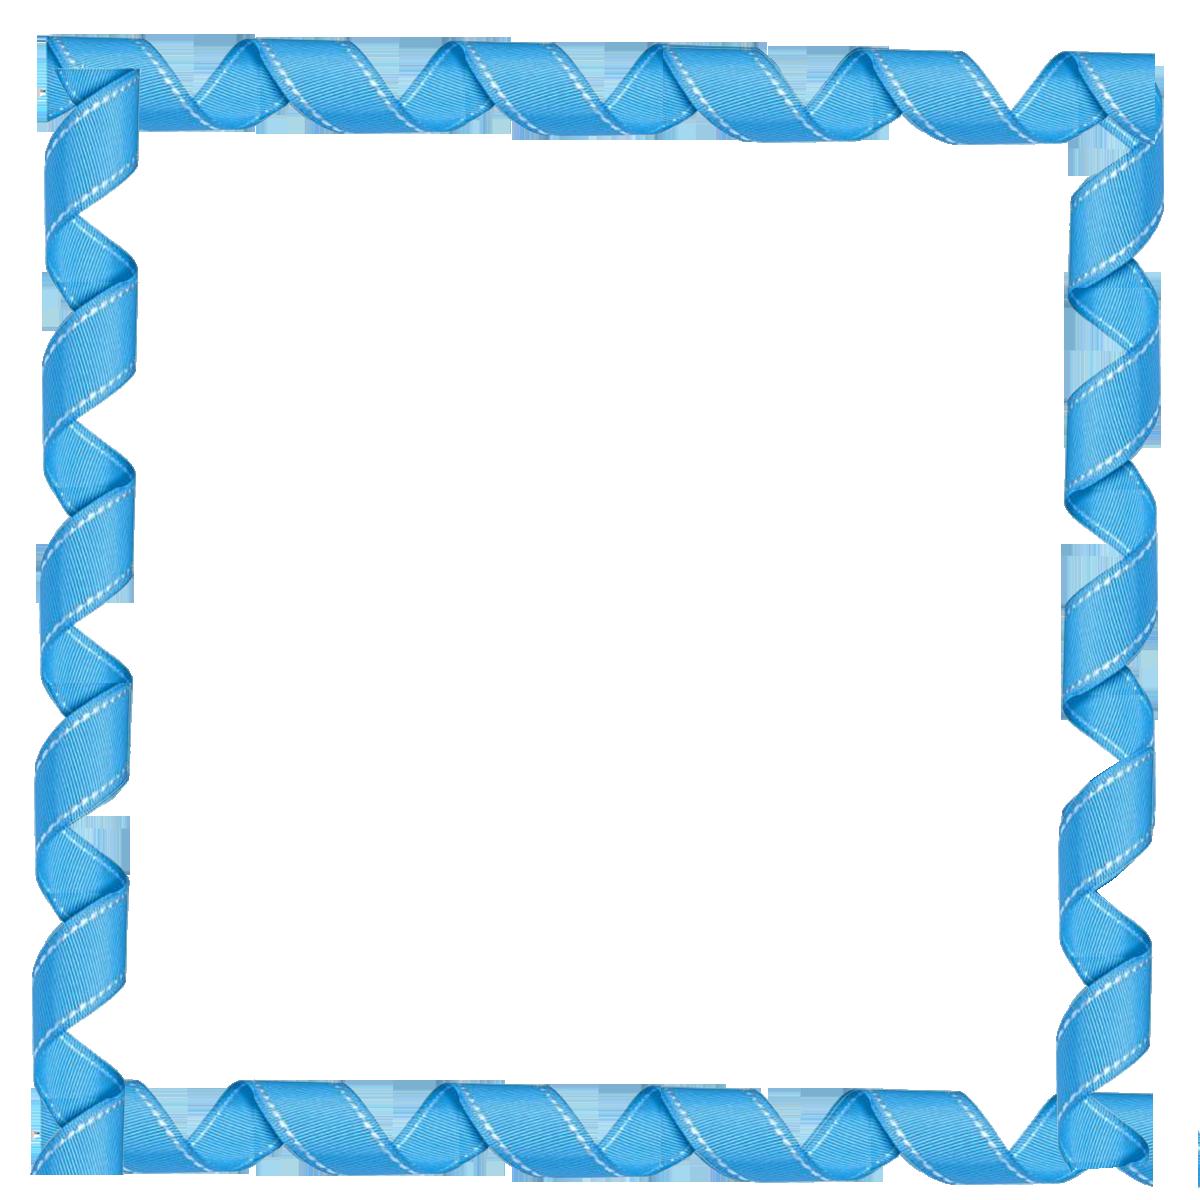 clipart frame blue